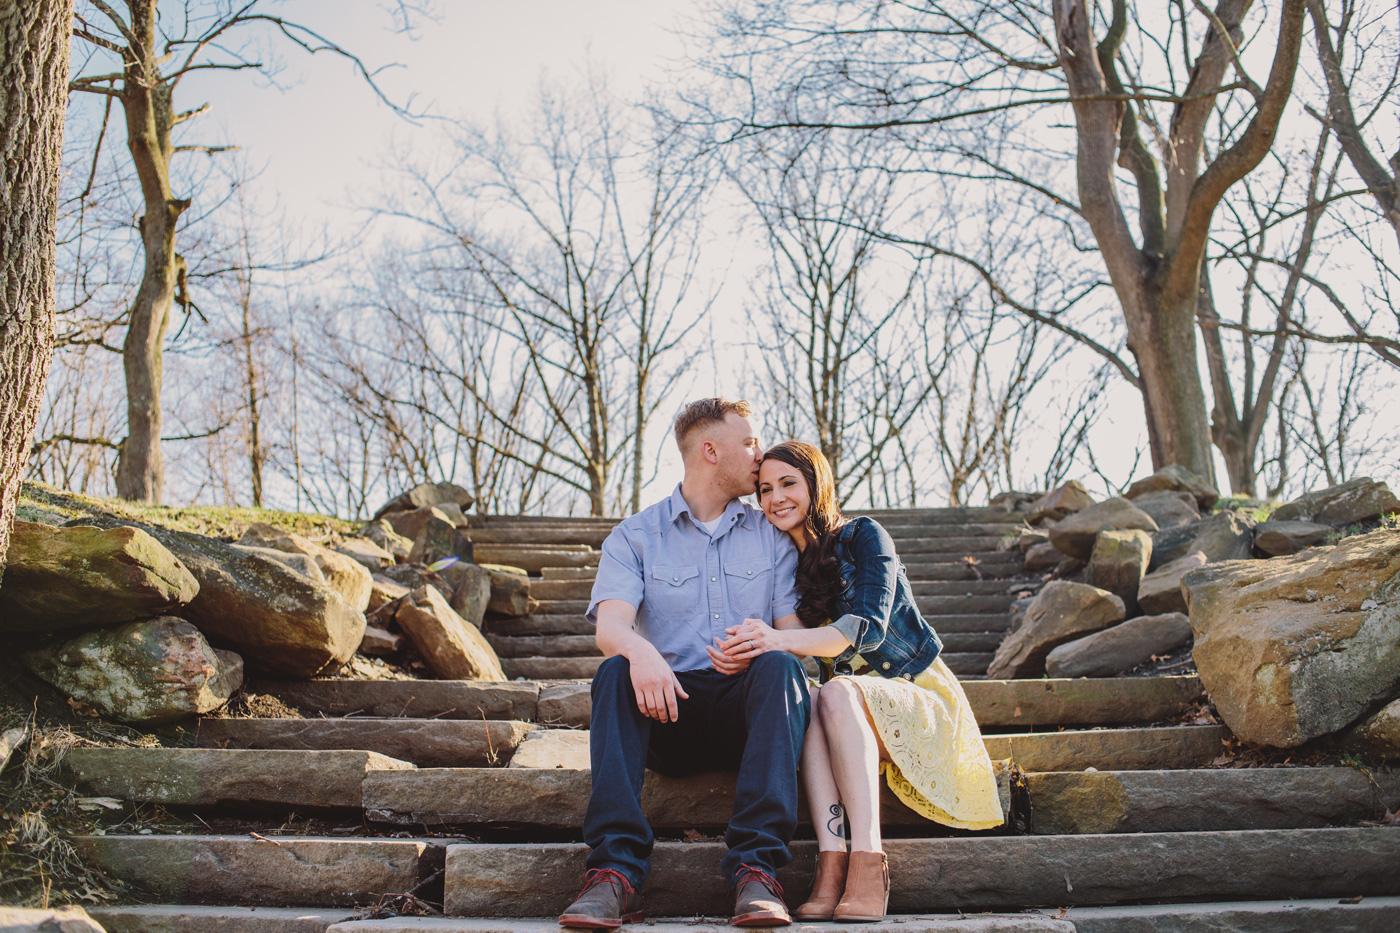 lawrenceville engagement photo